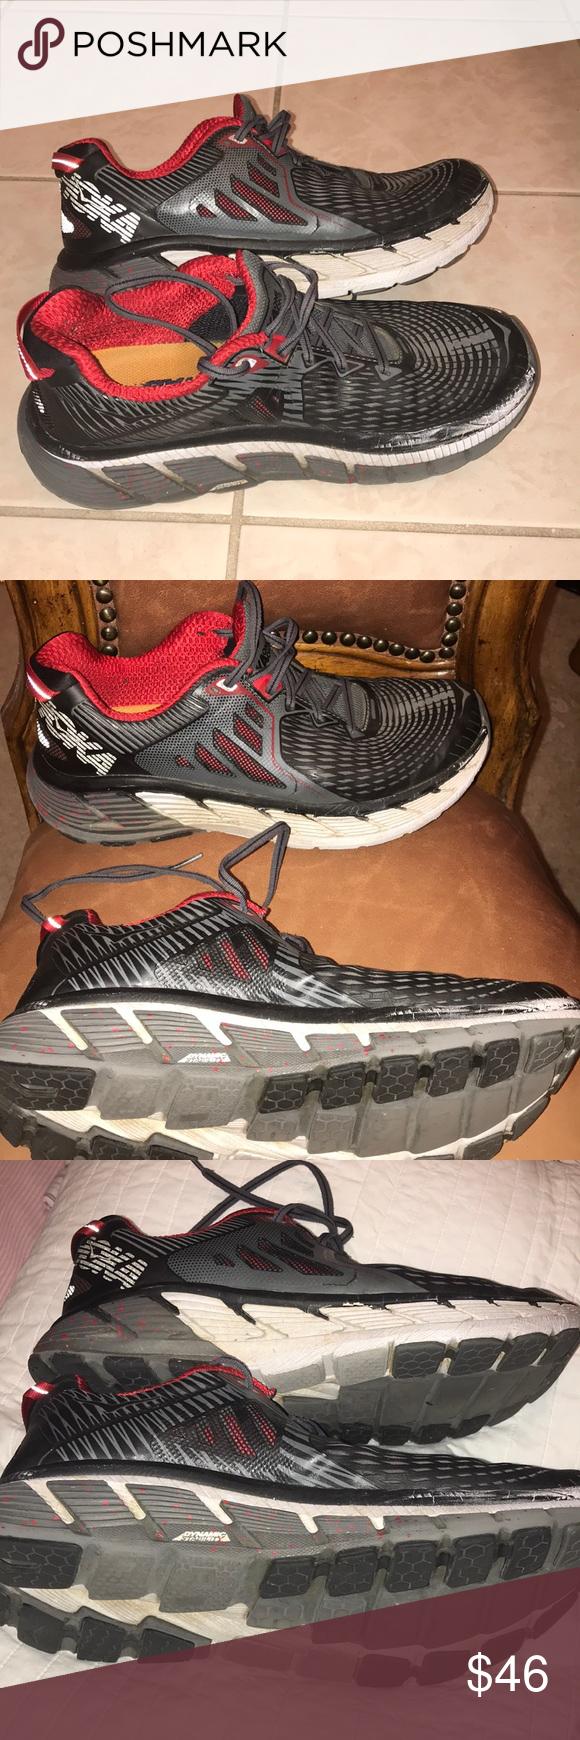 Hoka One One Running Shoes Men's Hoka One One Gaviota